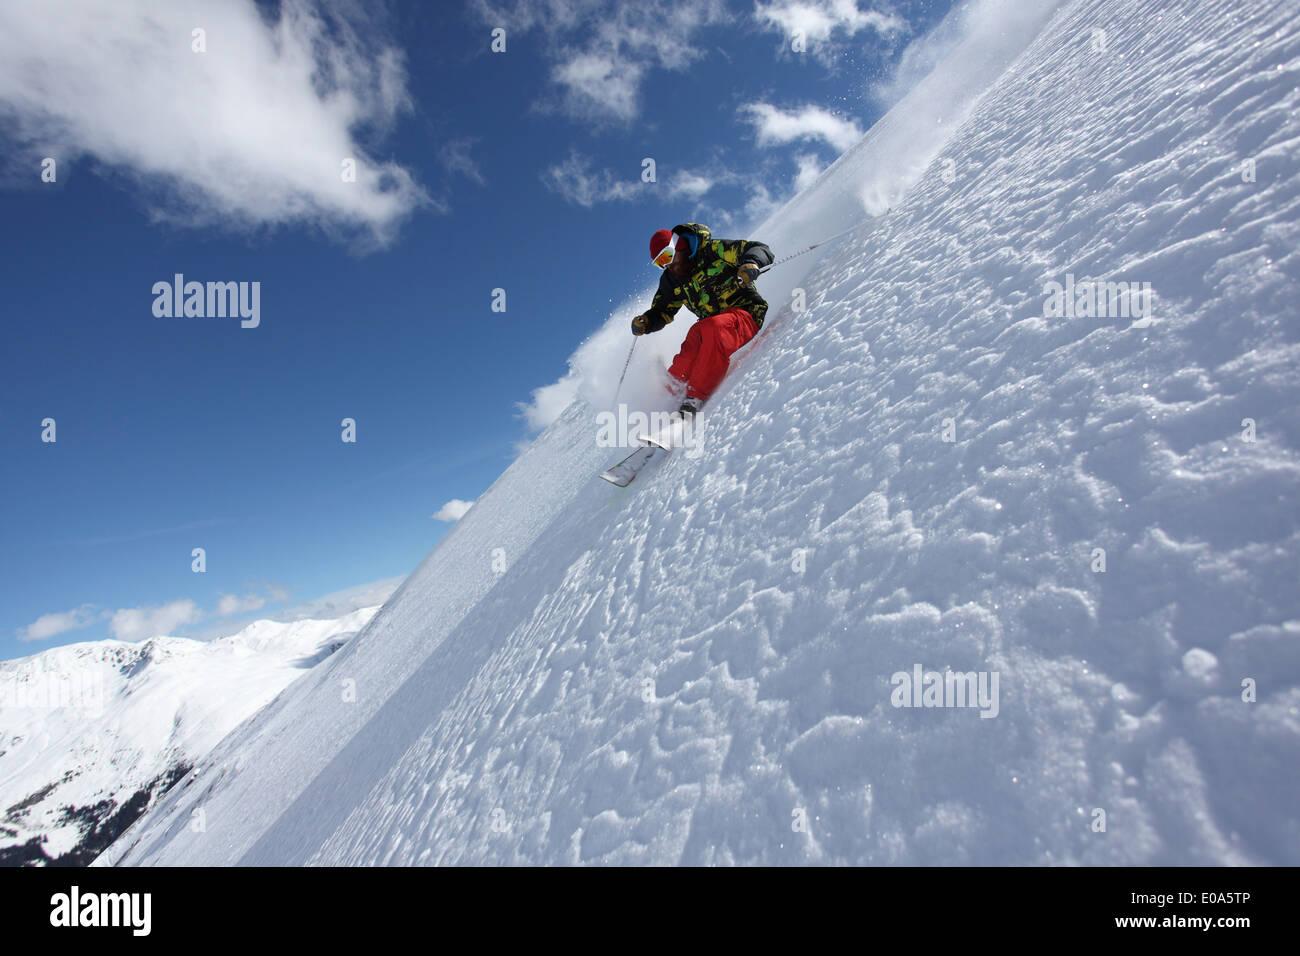 Ski man sur forte pente, Mayrhofen, Tyrol, Autriche Photo Stock